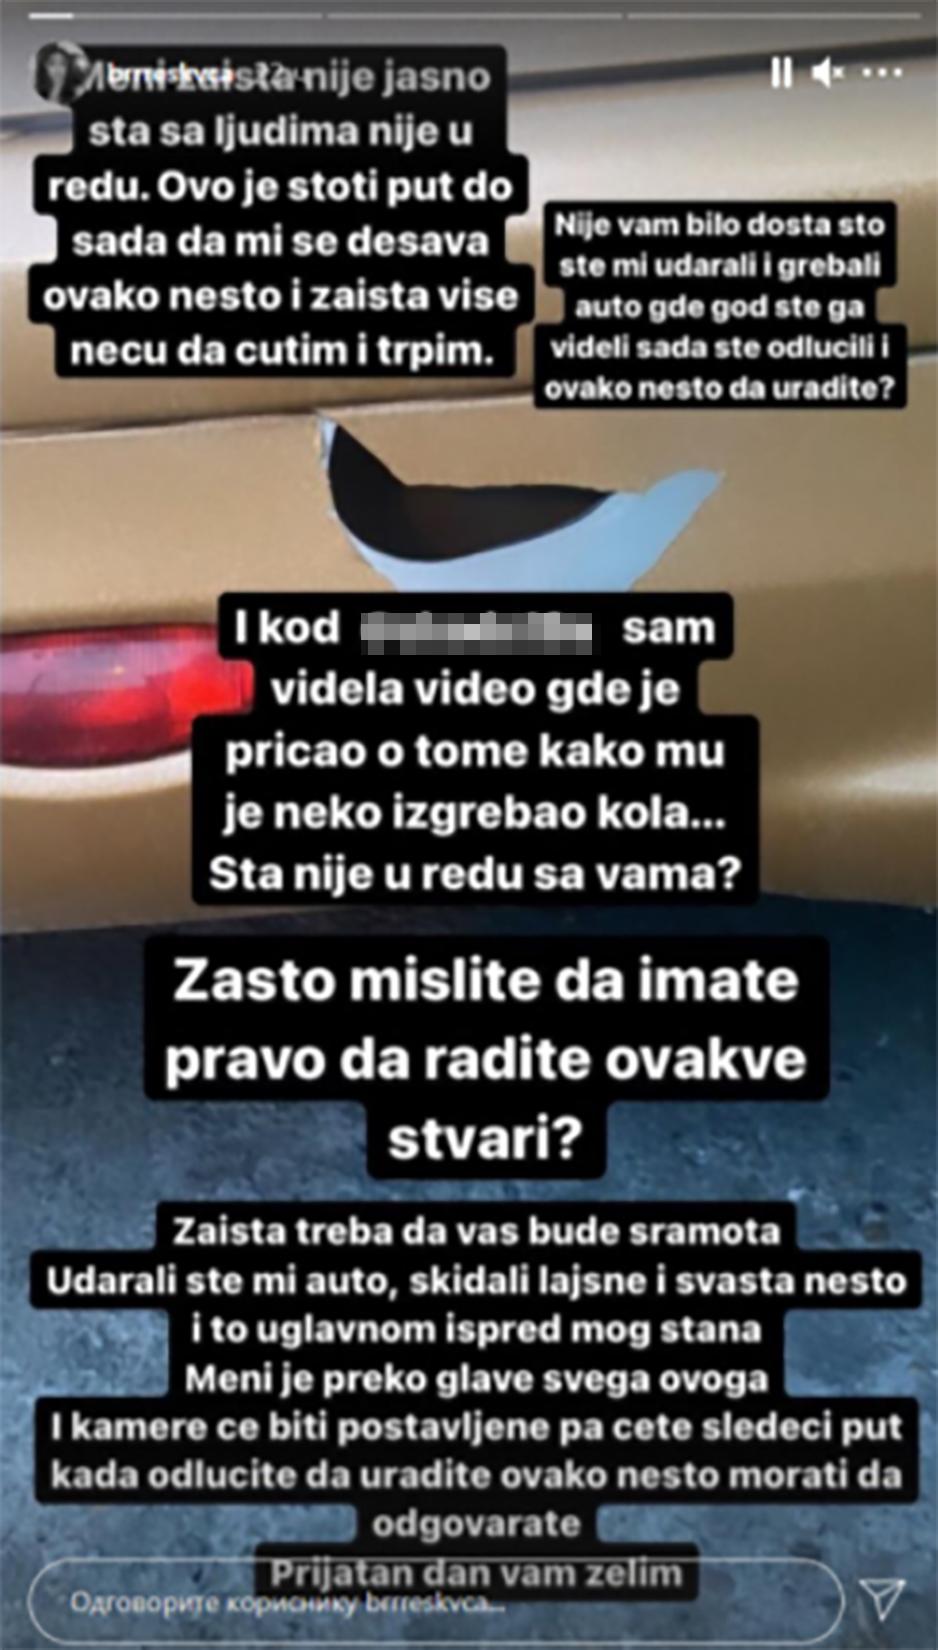 Breskvica, instagram, post, stori, story